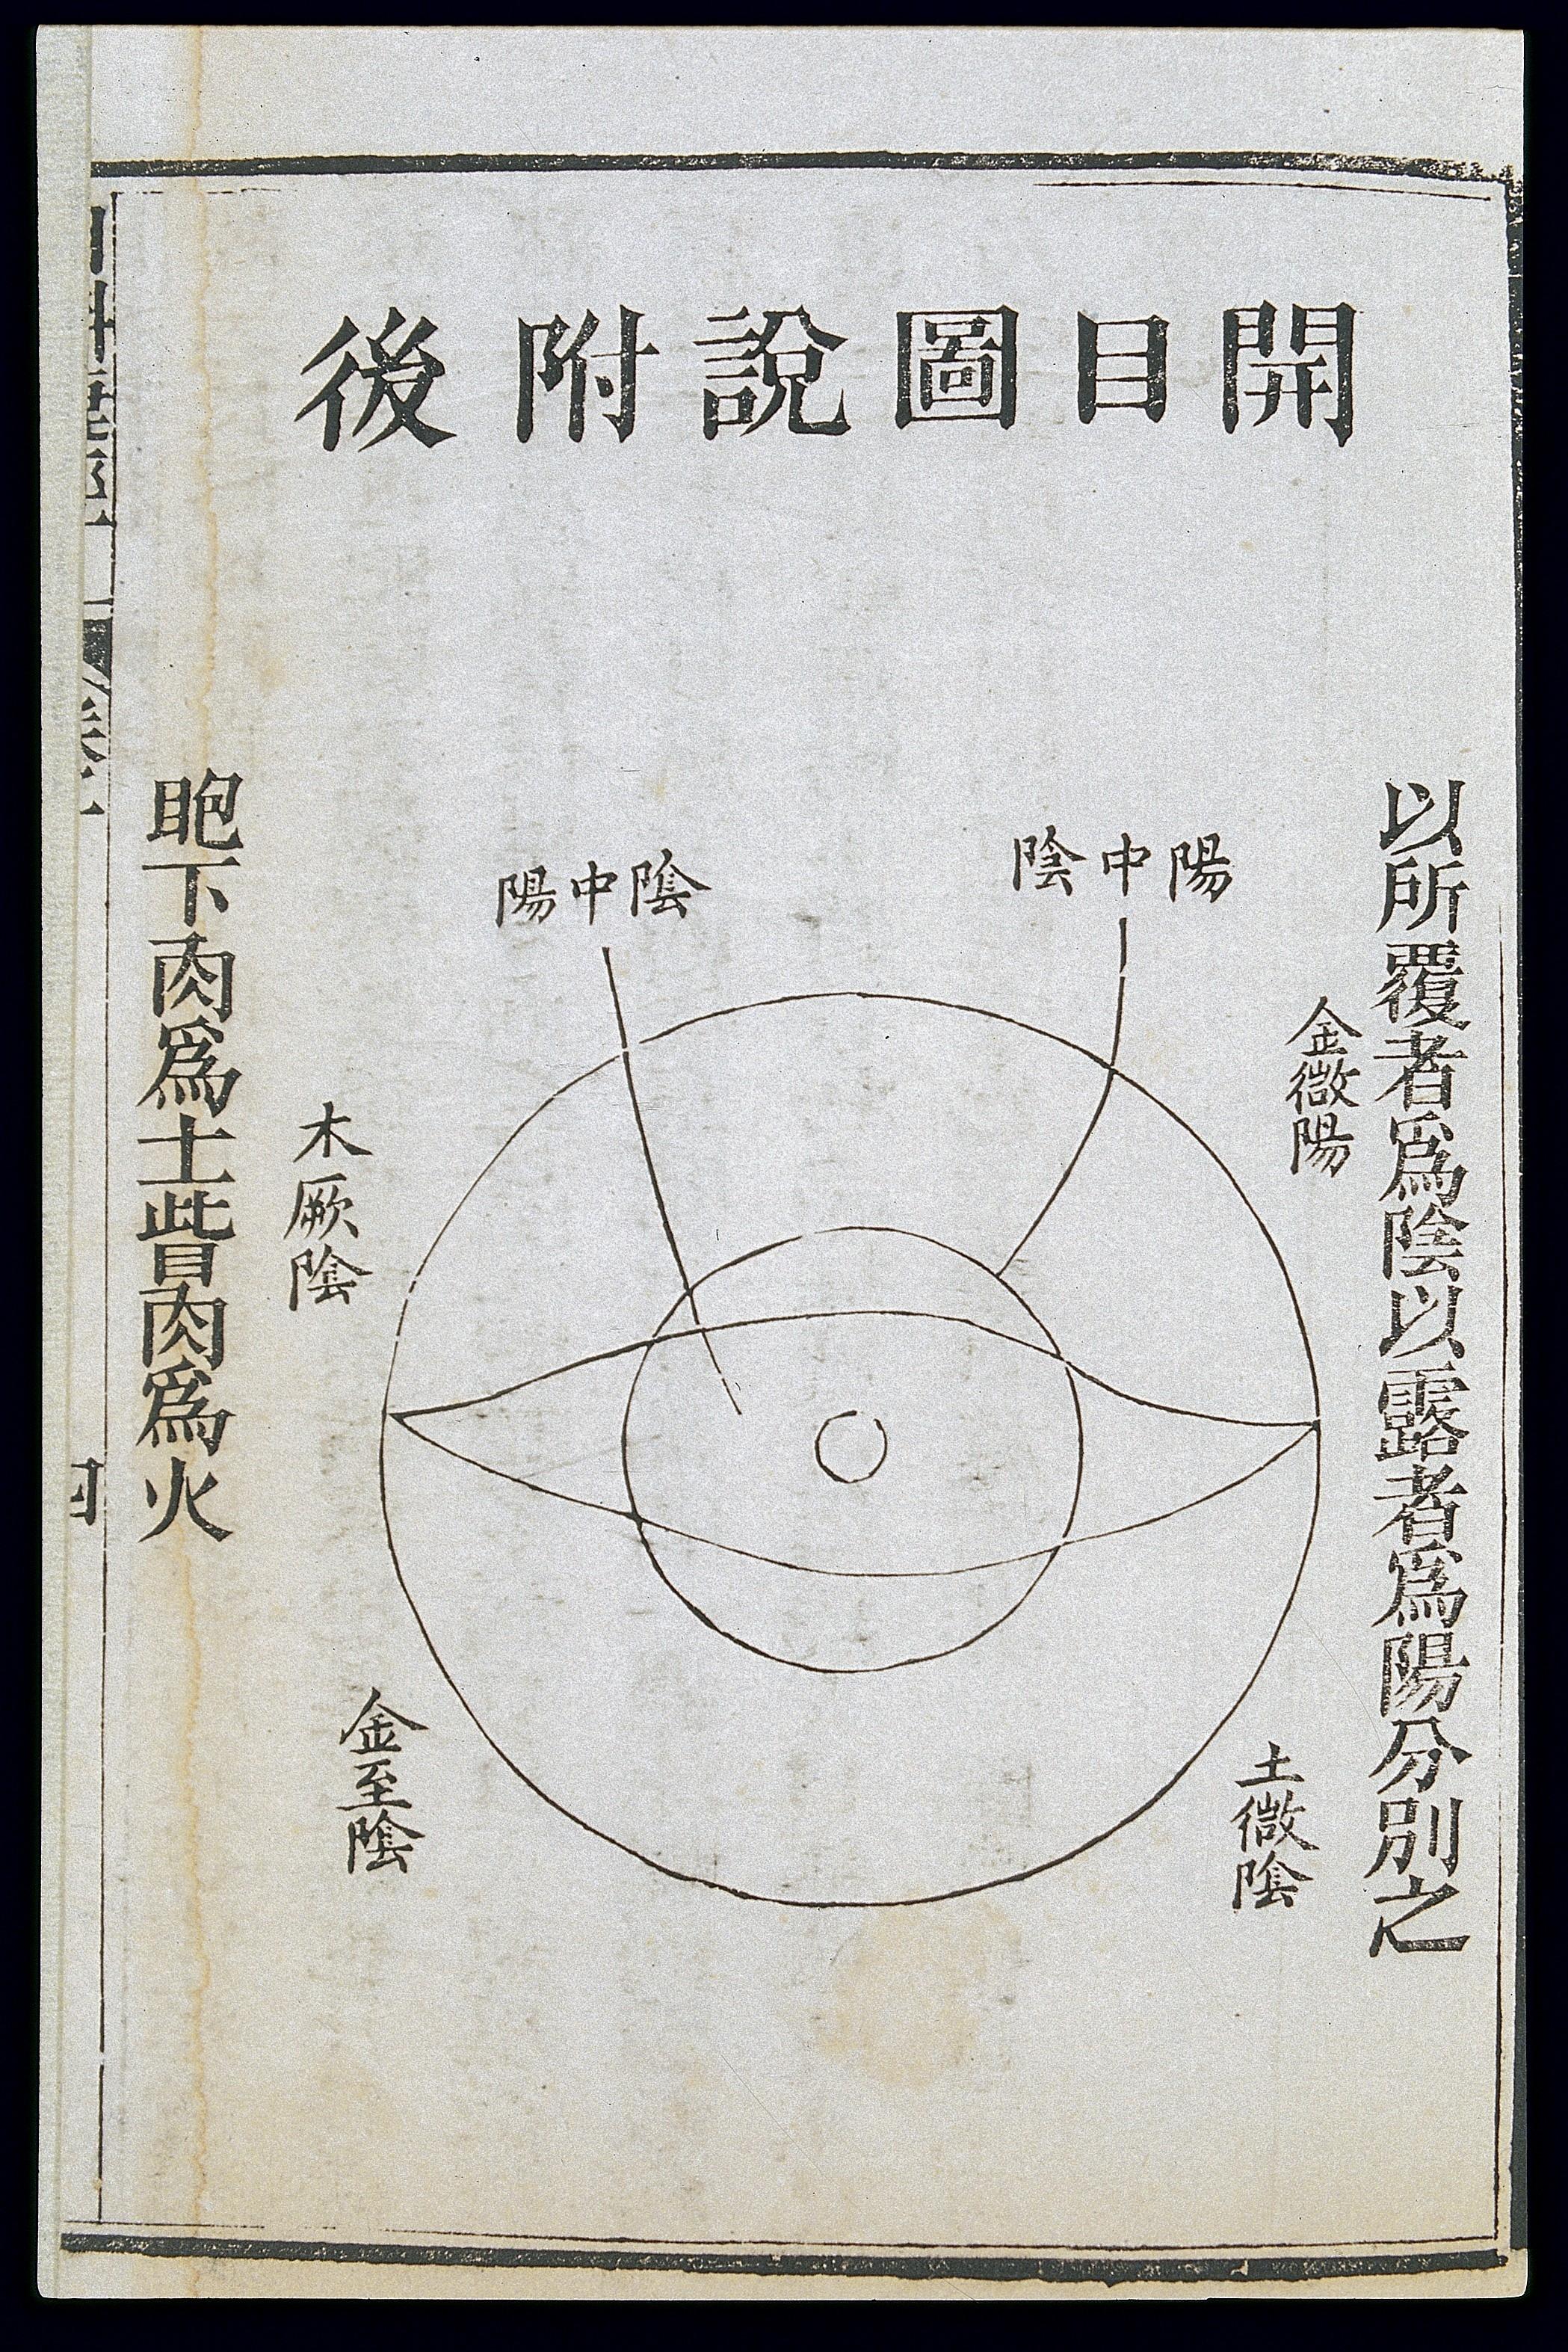 Filec19 chinese eye diagnosis chart showing yin and yang division filec19 chinese eye diagnosis chart showing yin and yang division wellcome l0039712g geenschuldenfo Choice Image